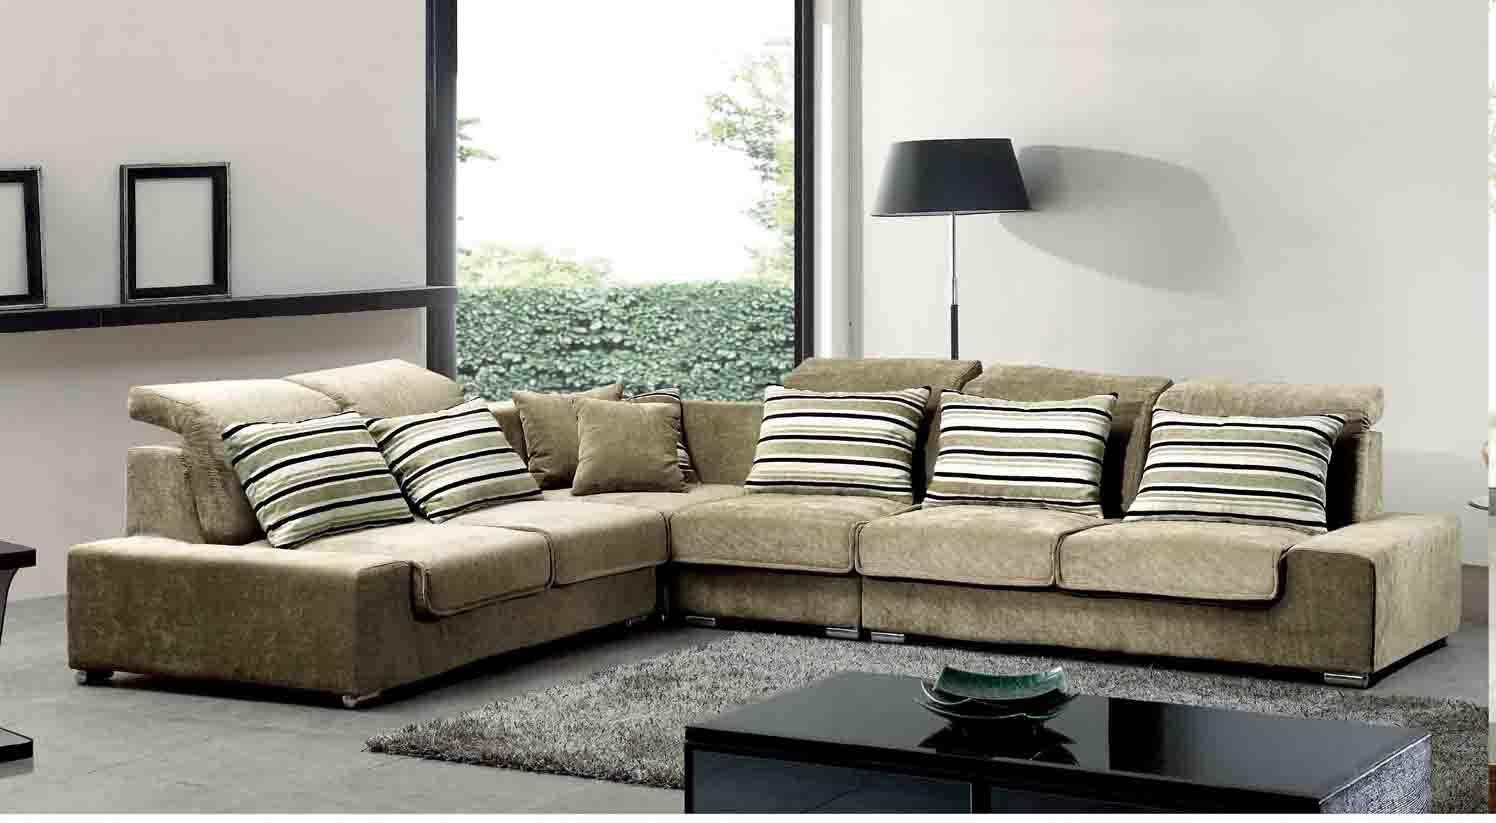 china stylish fabric sofa s 1207 china stylish fabric. Black Bedroom Furniture Sets. Home Design Ideas